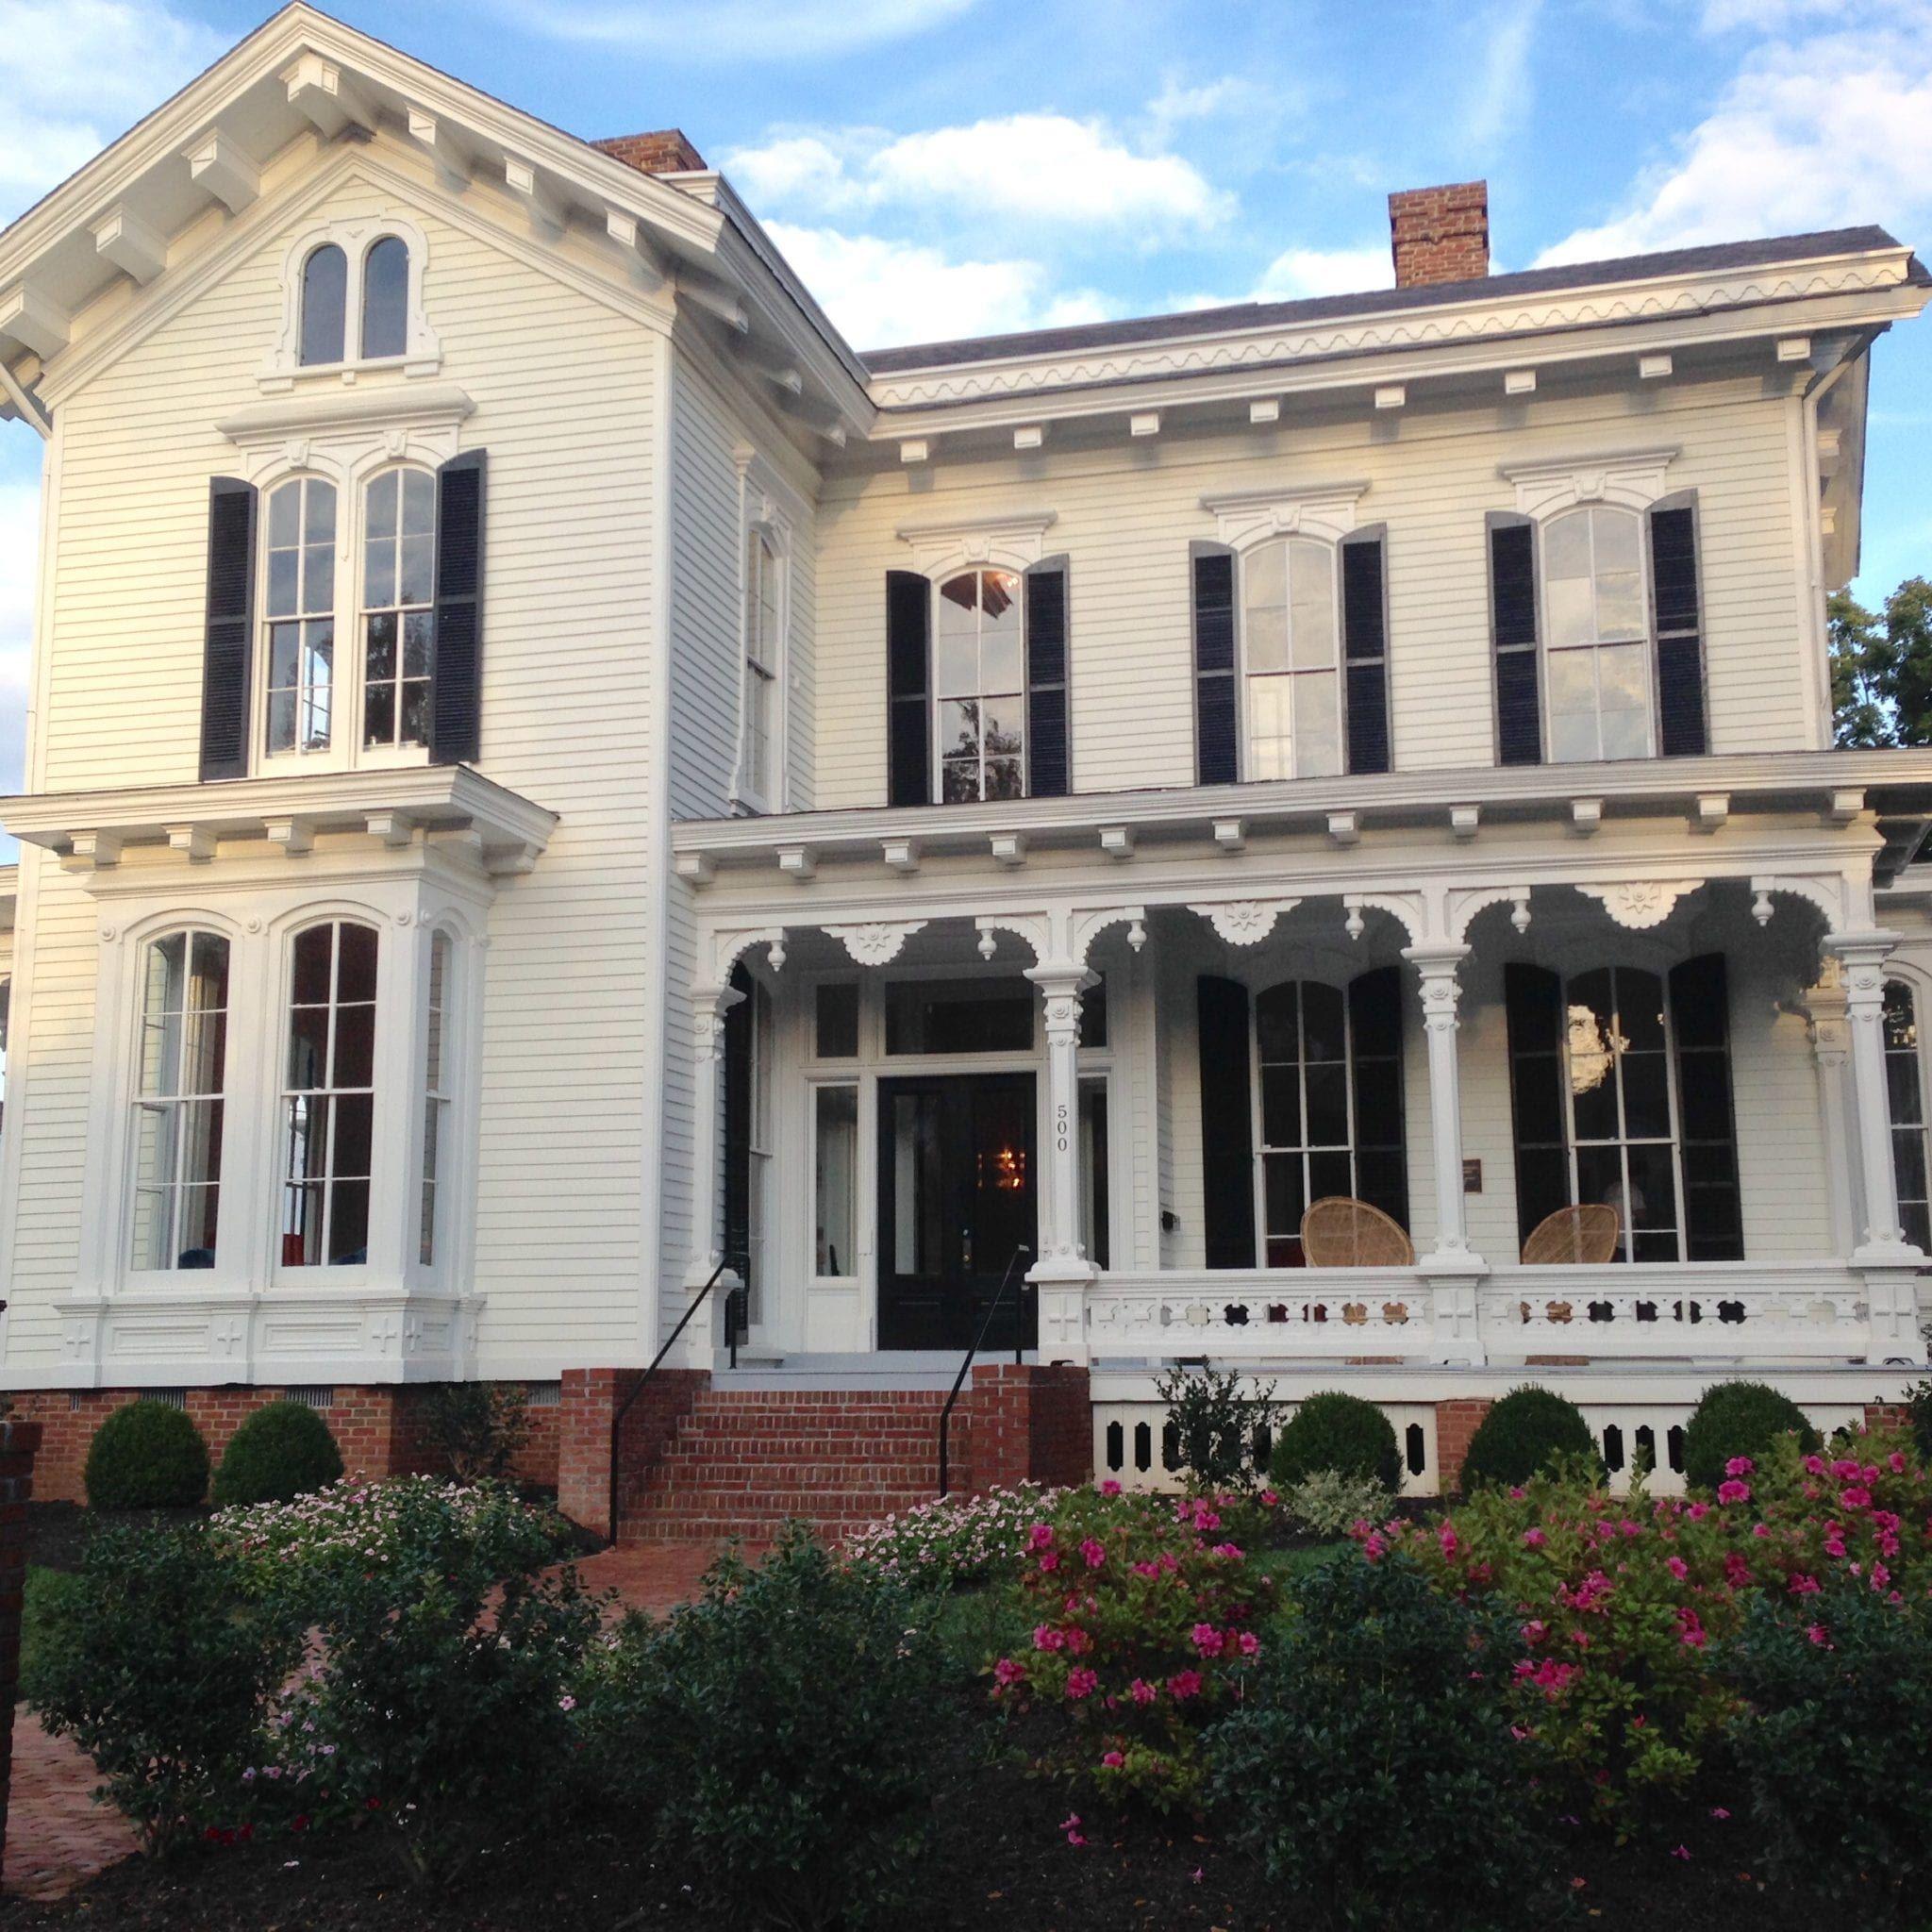 Merrimon-Wynne House